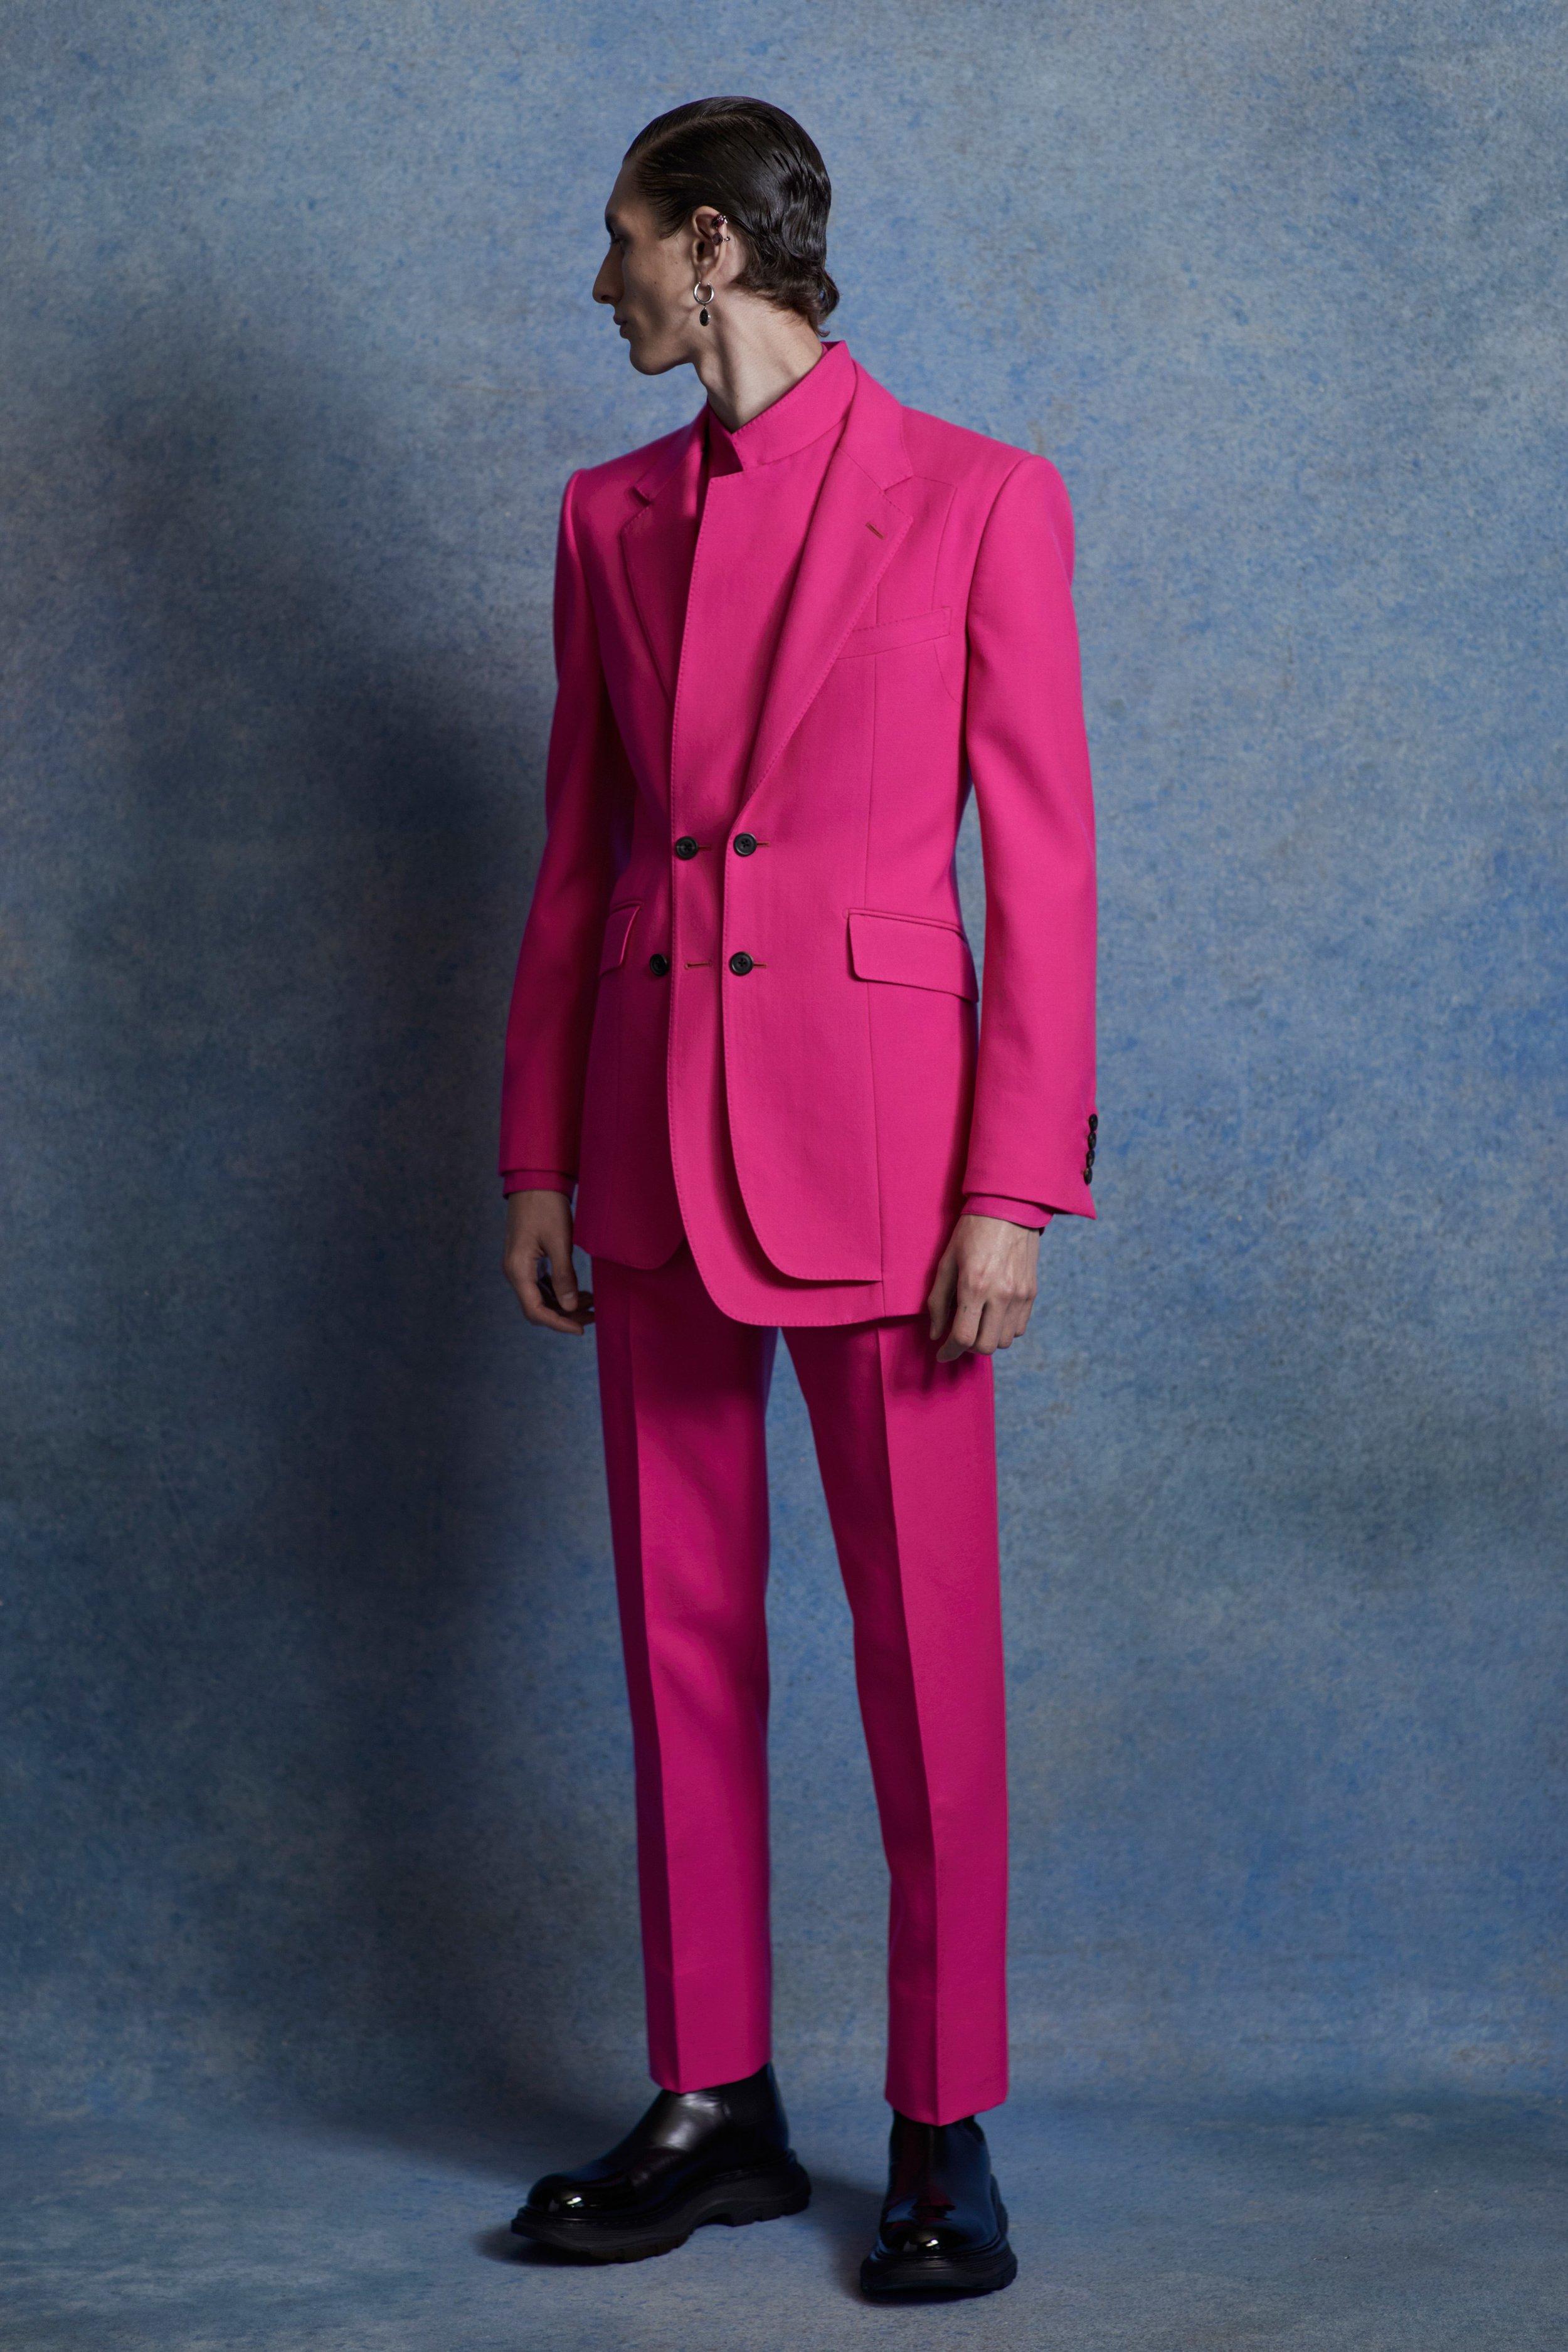 00005-alexander-mcqueen-menswear-spring-20-credit-Ethan-James-Green.jpg